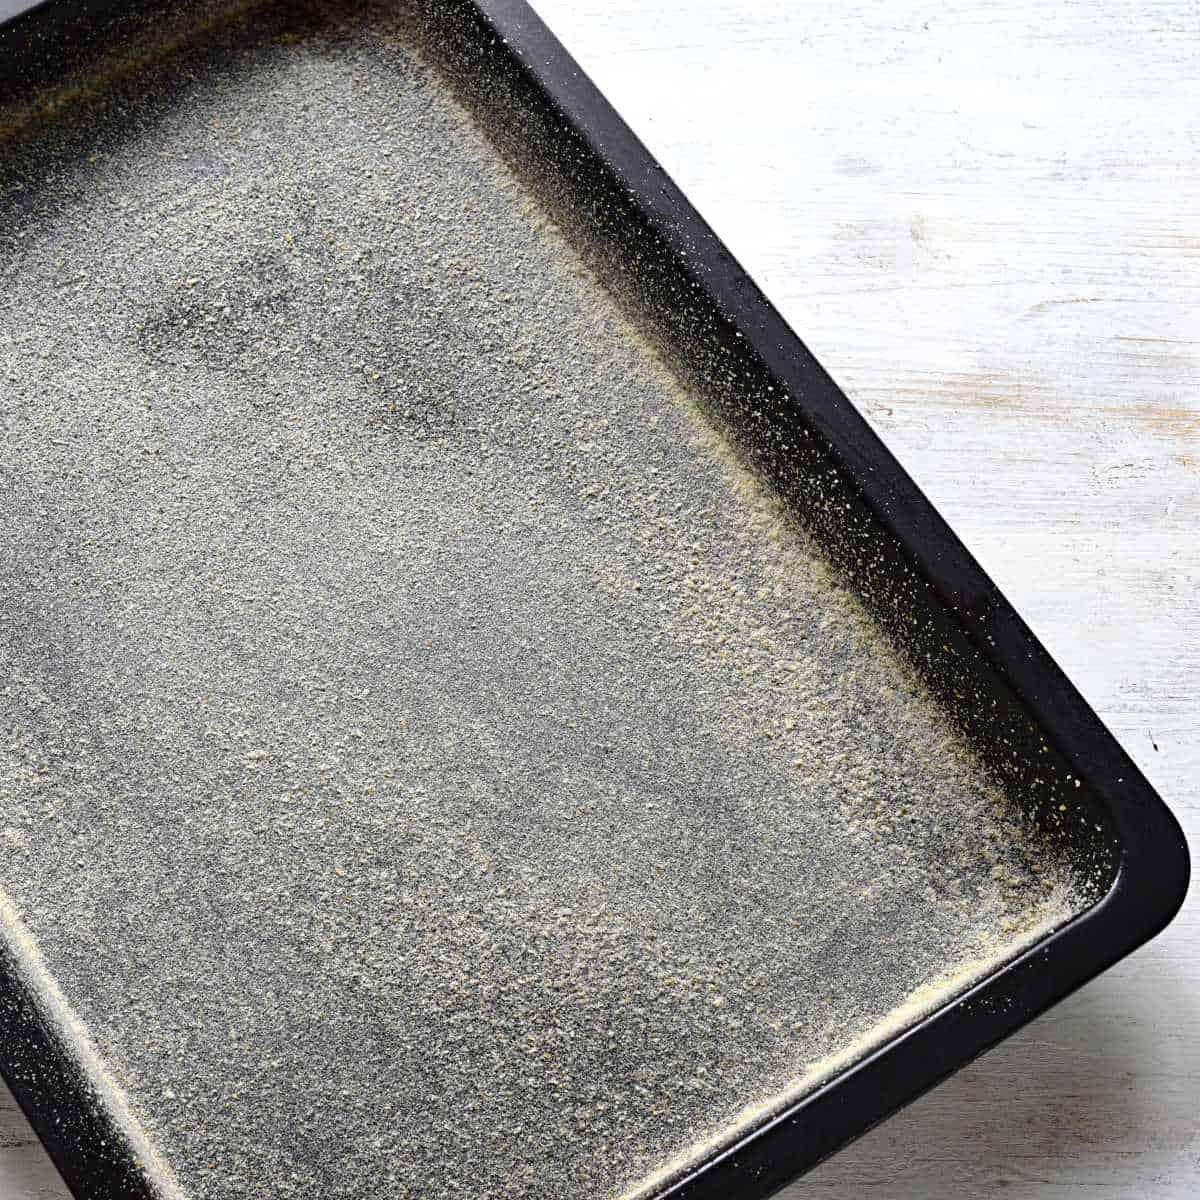 Prepared baking sheet for a buttermilk cake.